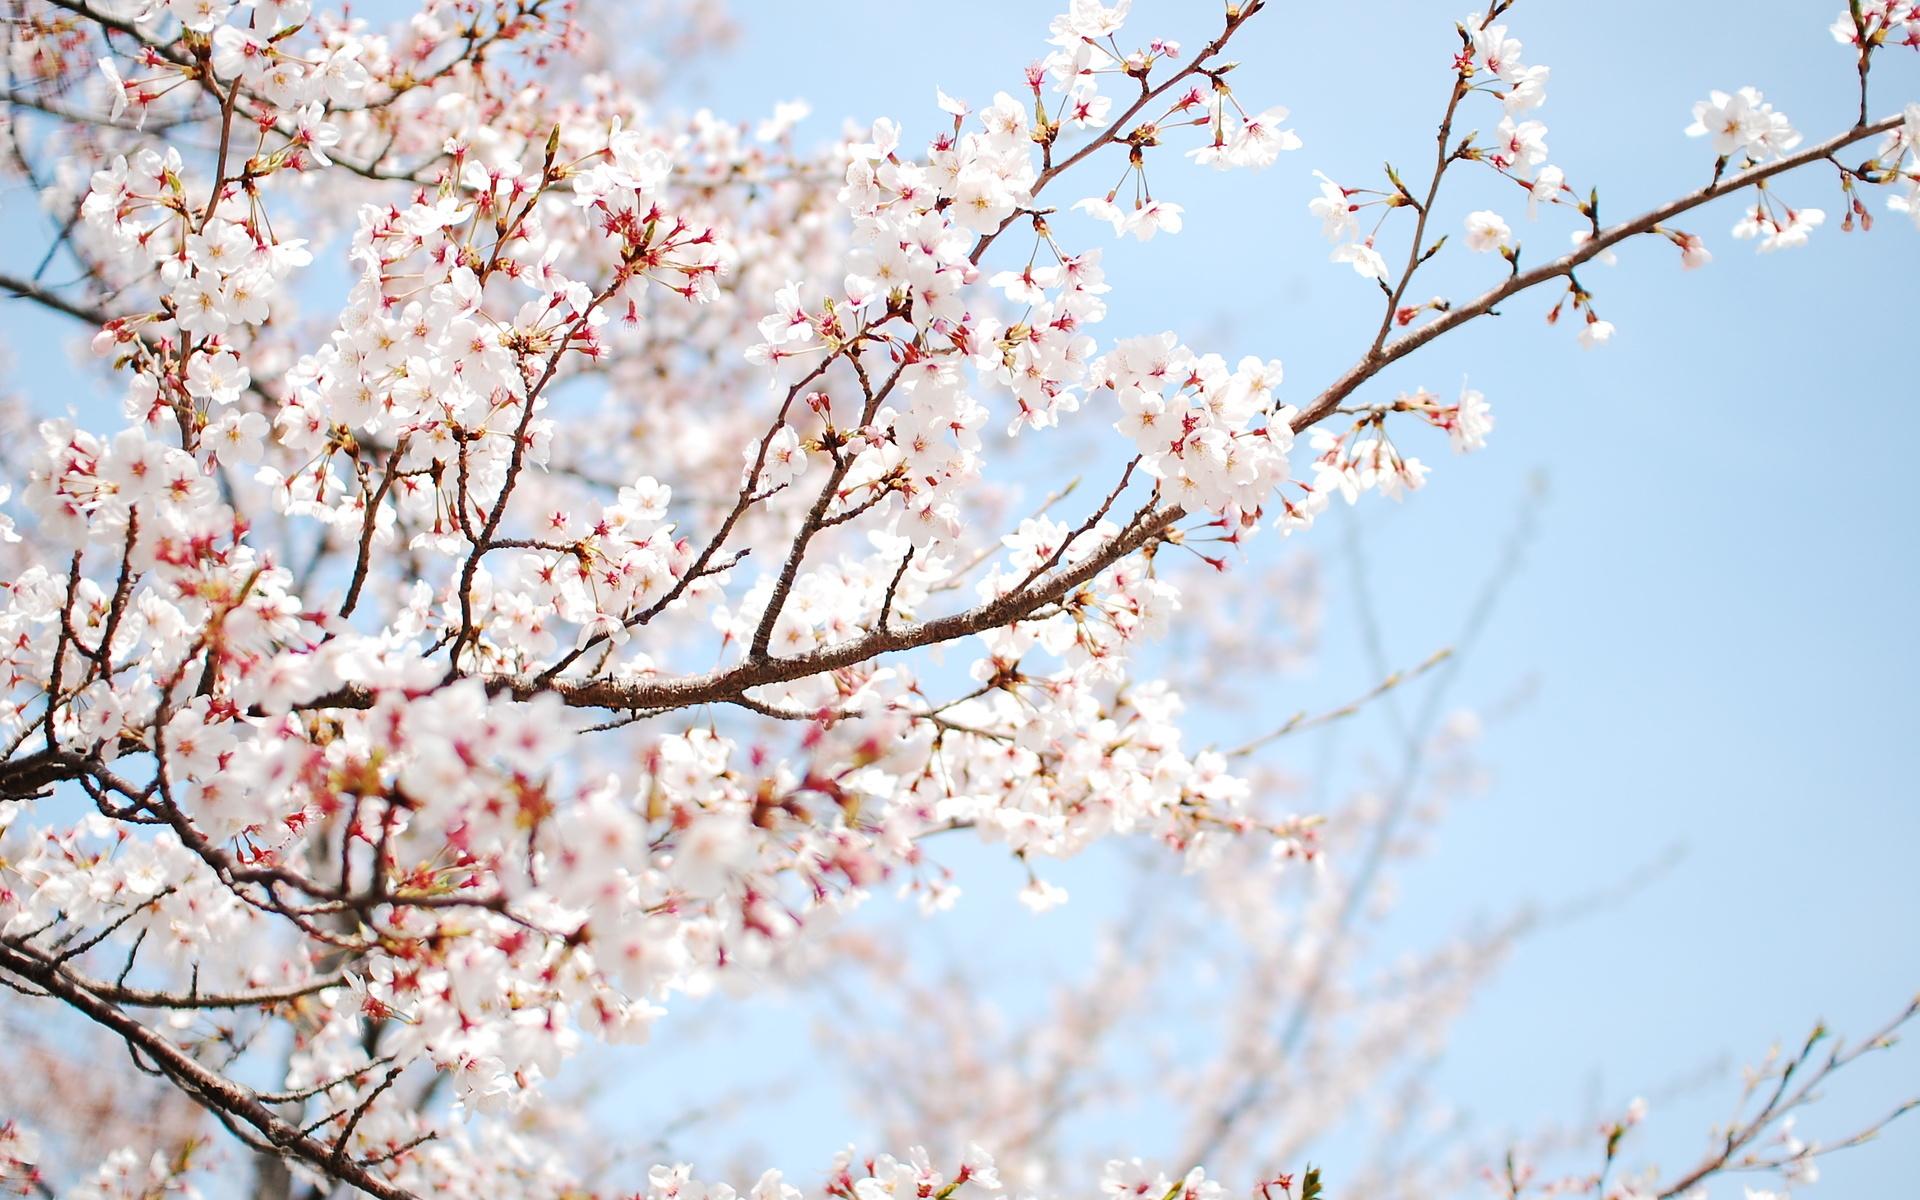 14751 descargar fondo de pantalla Plantas, Flores, Árboles: protectores de pantalla e imágenes gratis